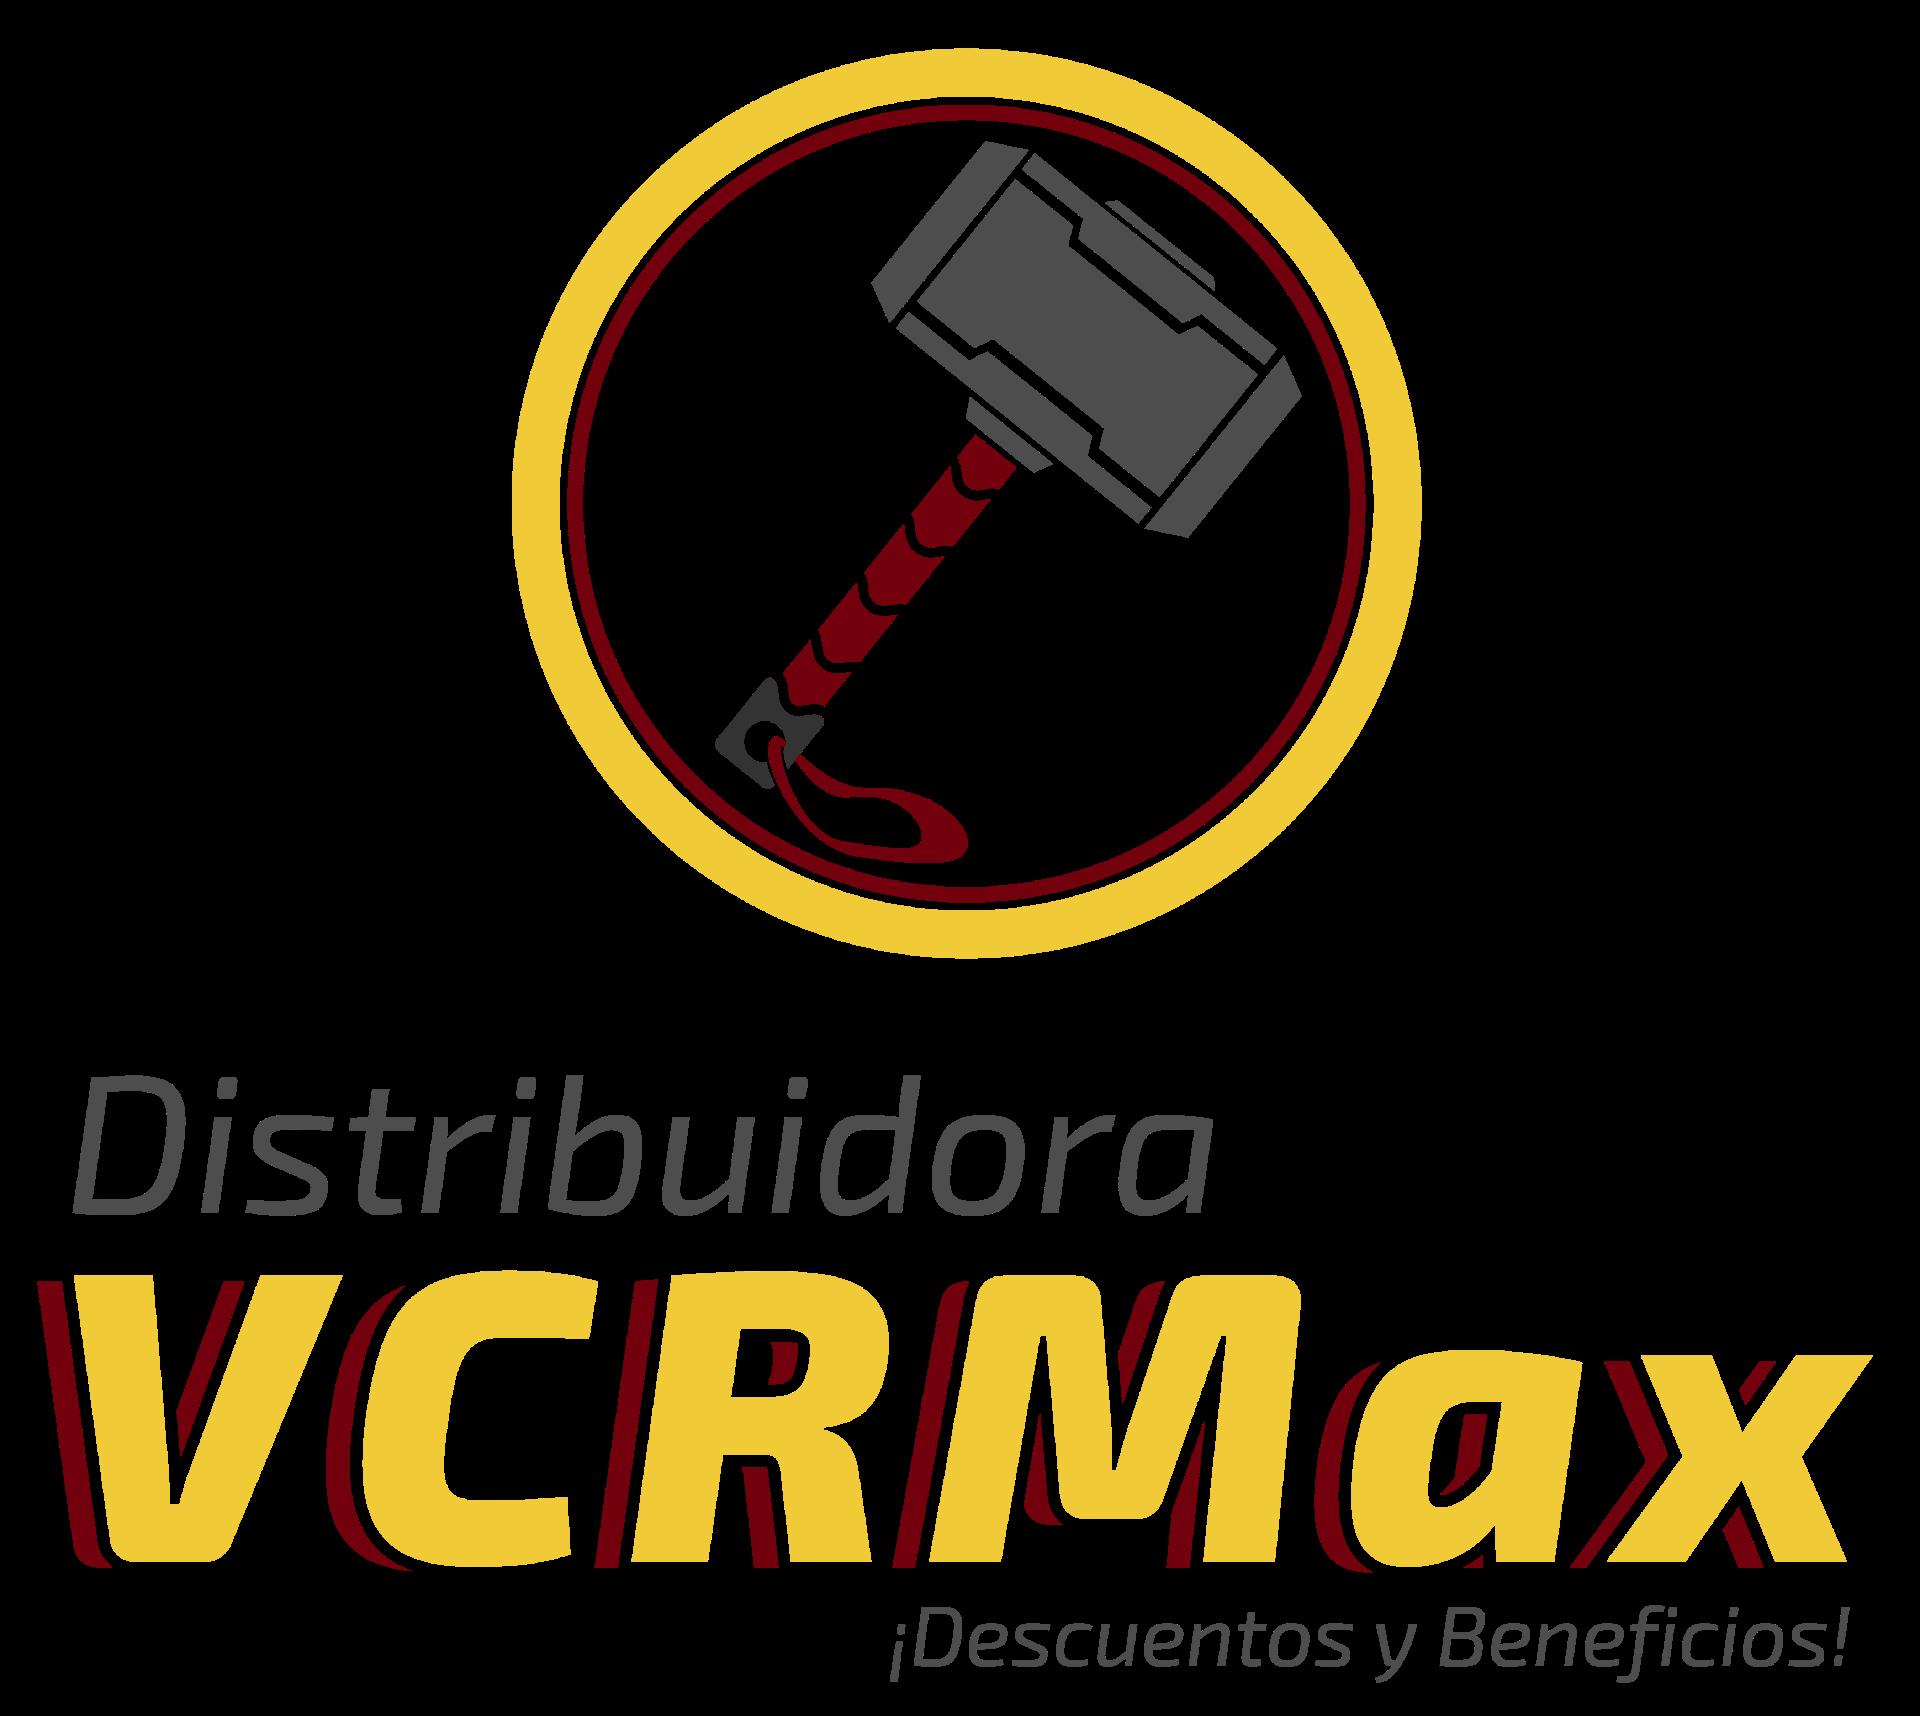 VCRMAX